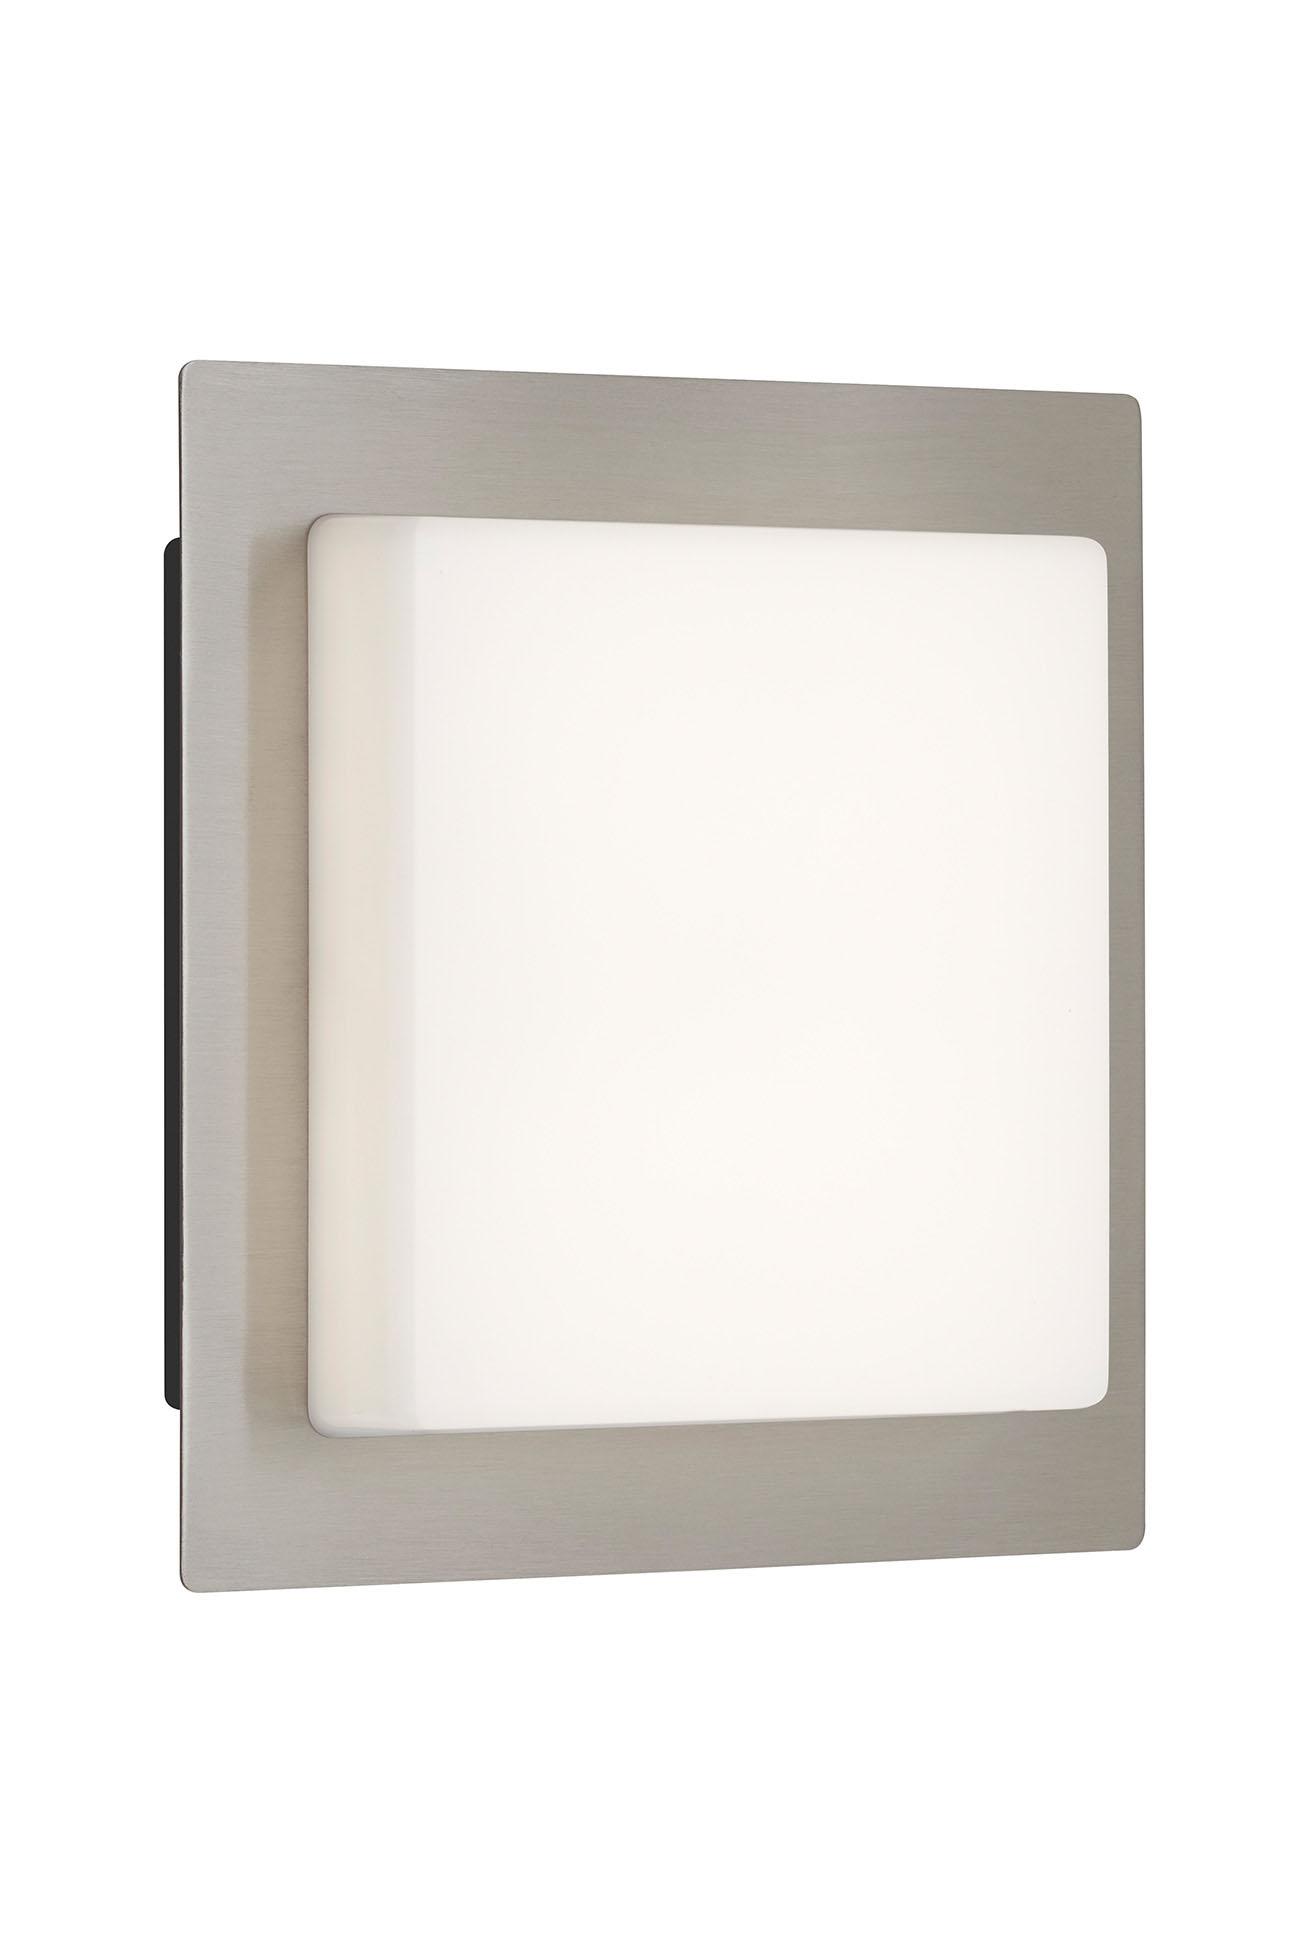 TELEFUNKEN LED Aussenwandleuchte, 30 cm, 15 W, Silber